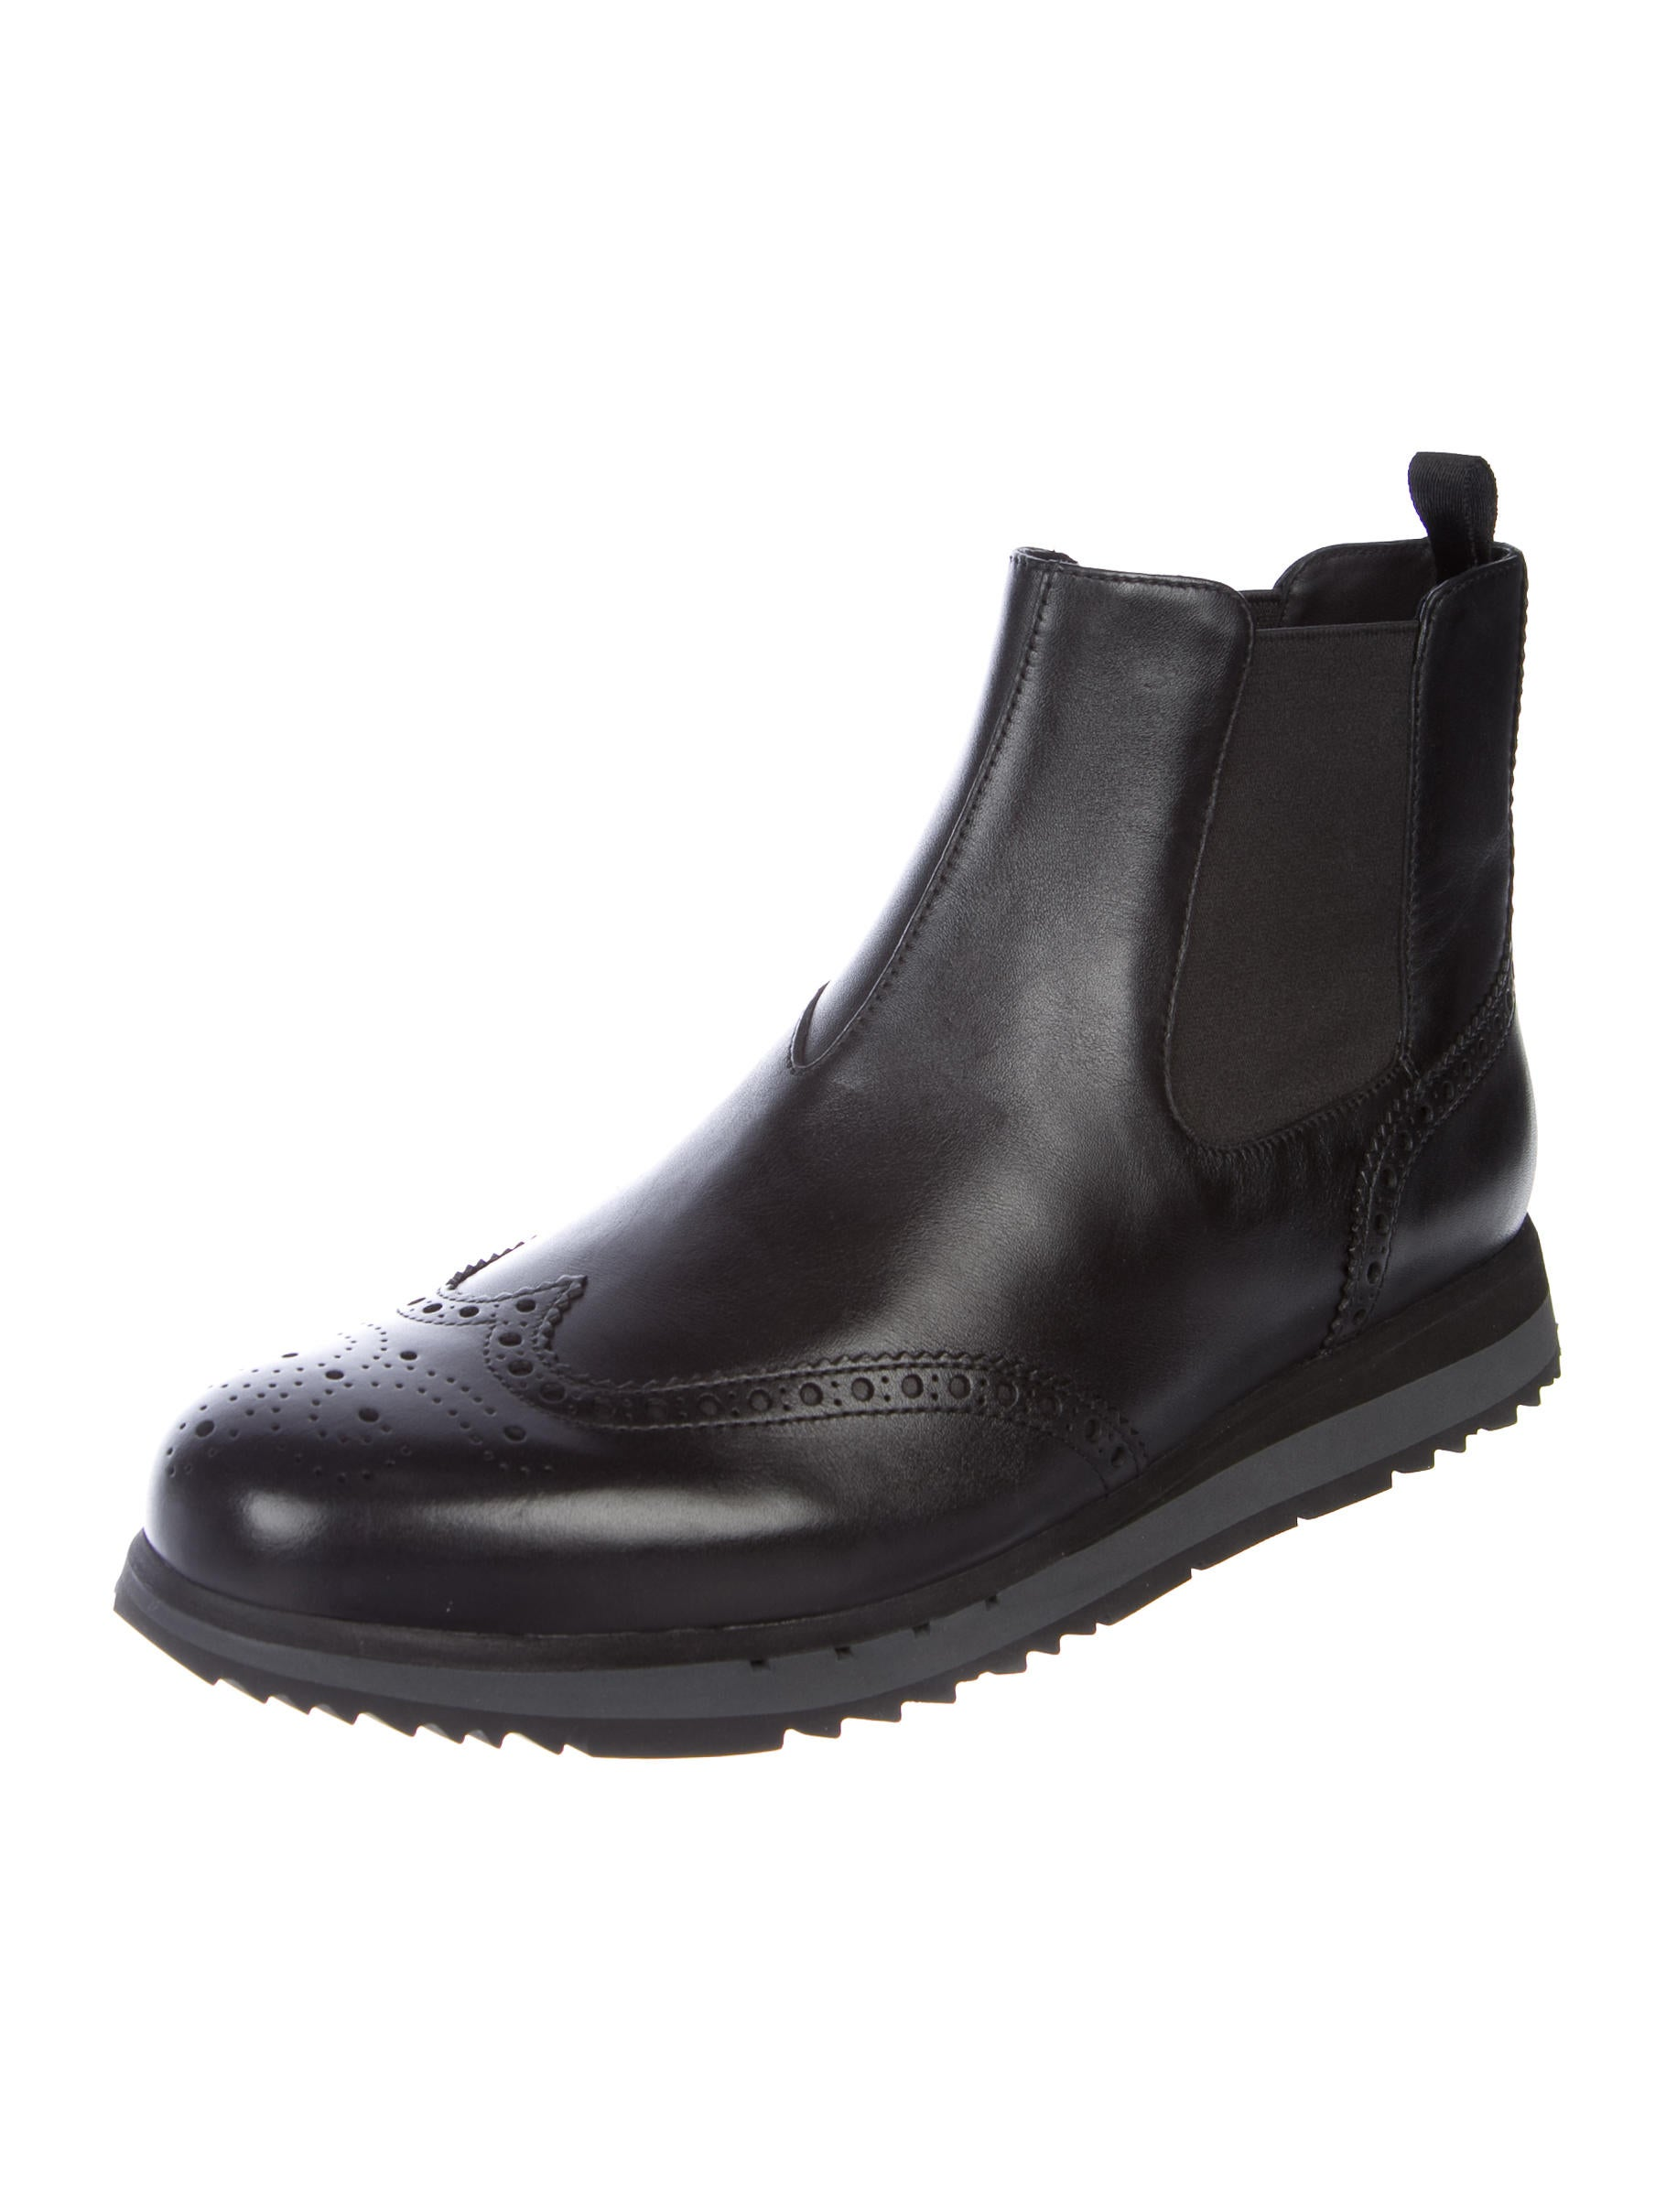 Elegant Big Size Women Chelsea Boots - ChelseaBootsWomen.com